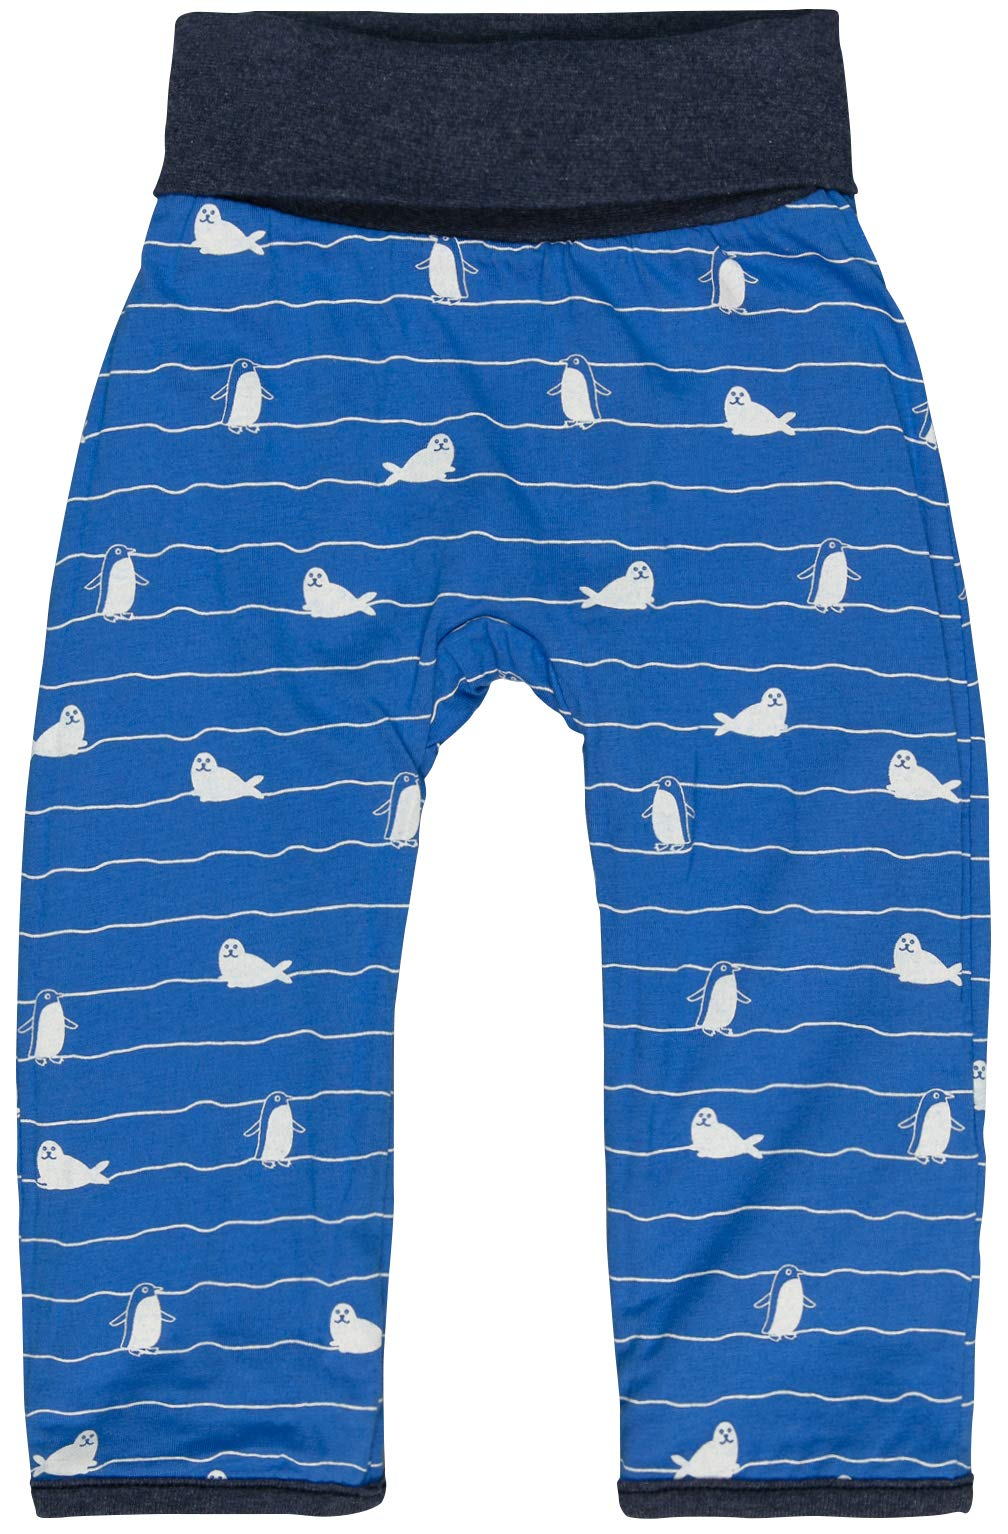 loud + proud Wendehose Strick Aus Bio Baumwolle, Gots Zertifiziert Pantalones para Bebés 4